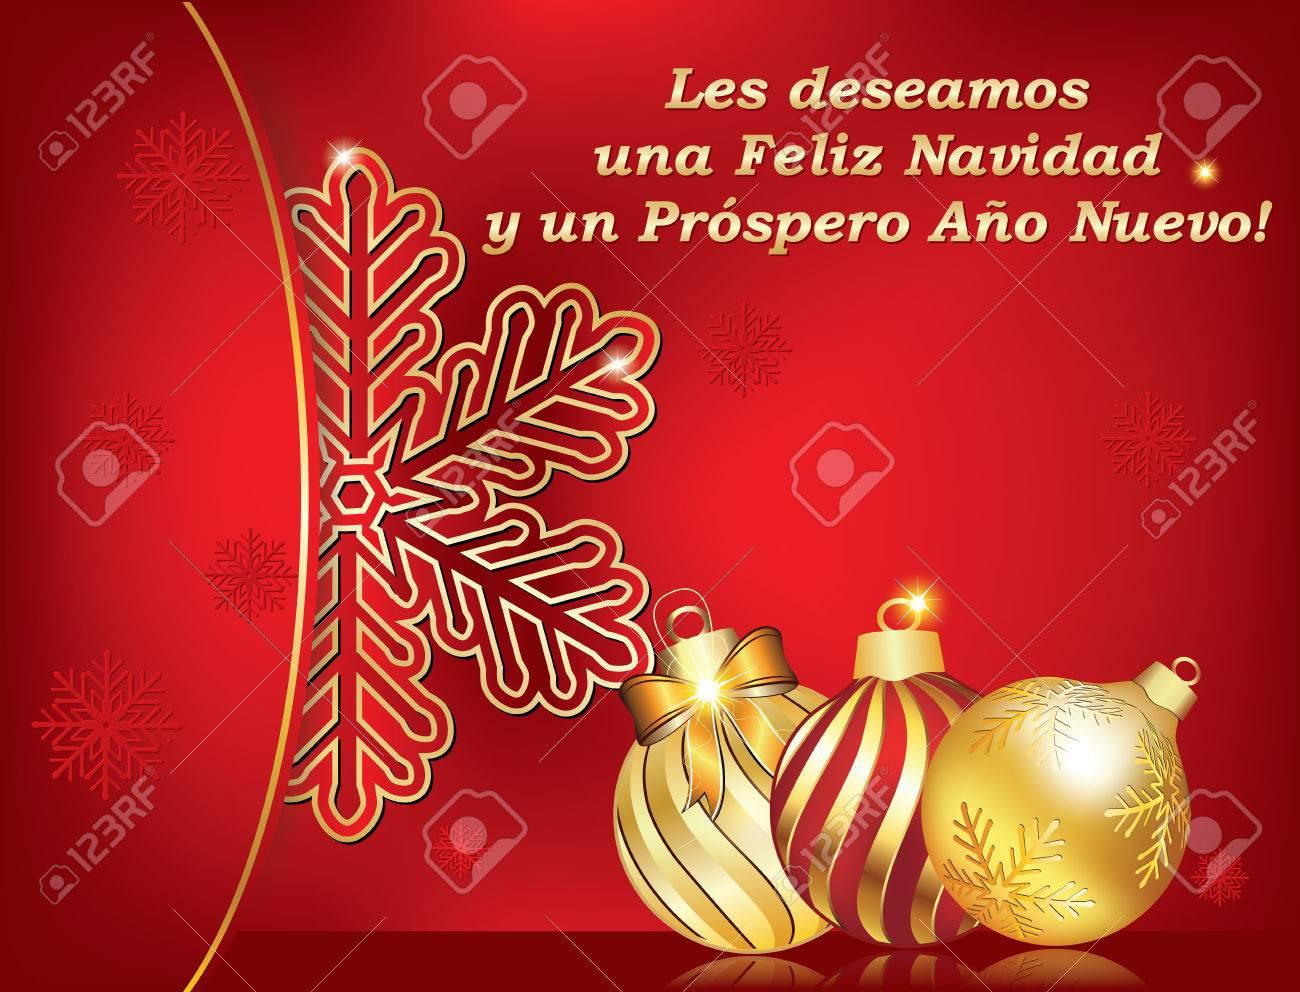 Spanish Seasons Greetings Christmas New Year Card Les Deseamos